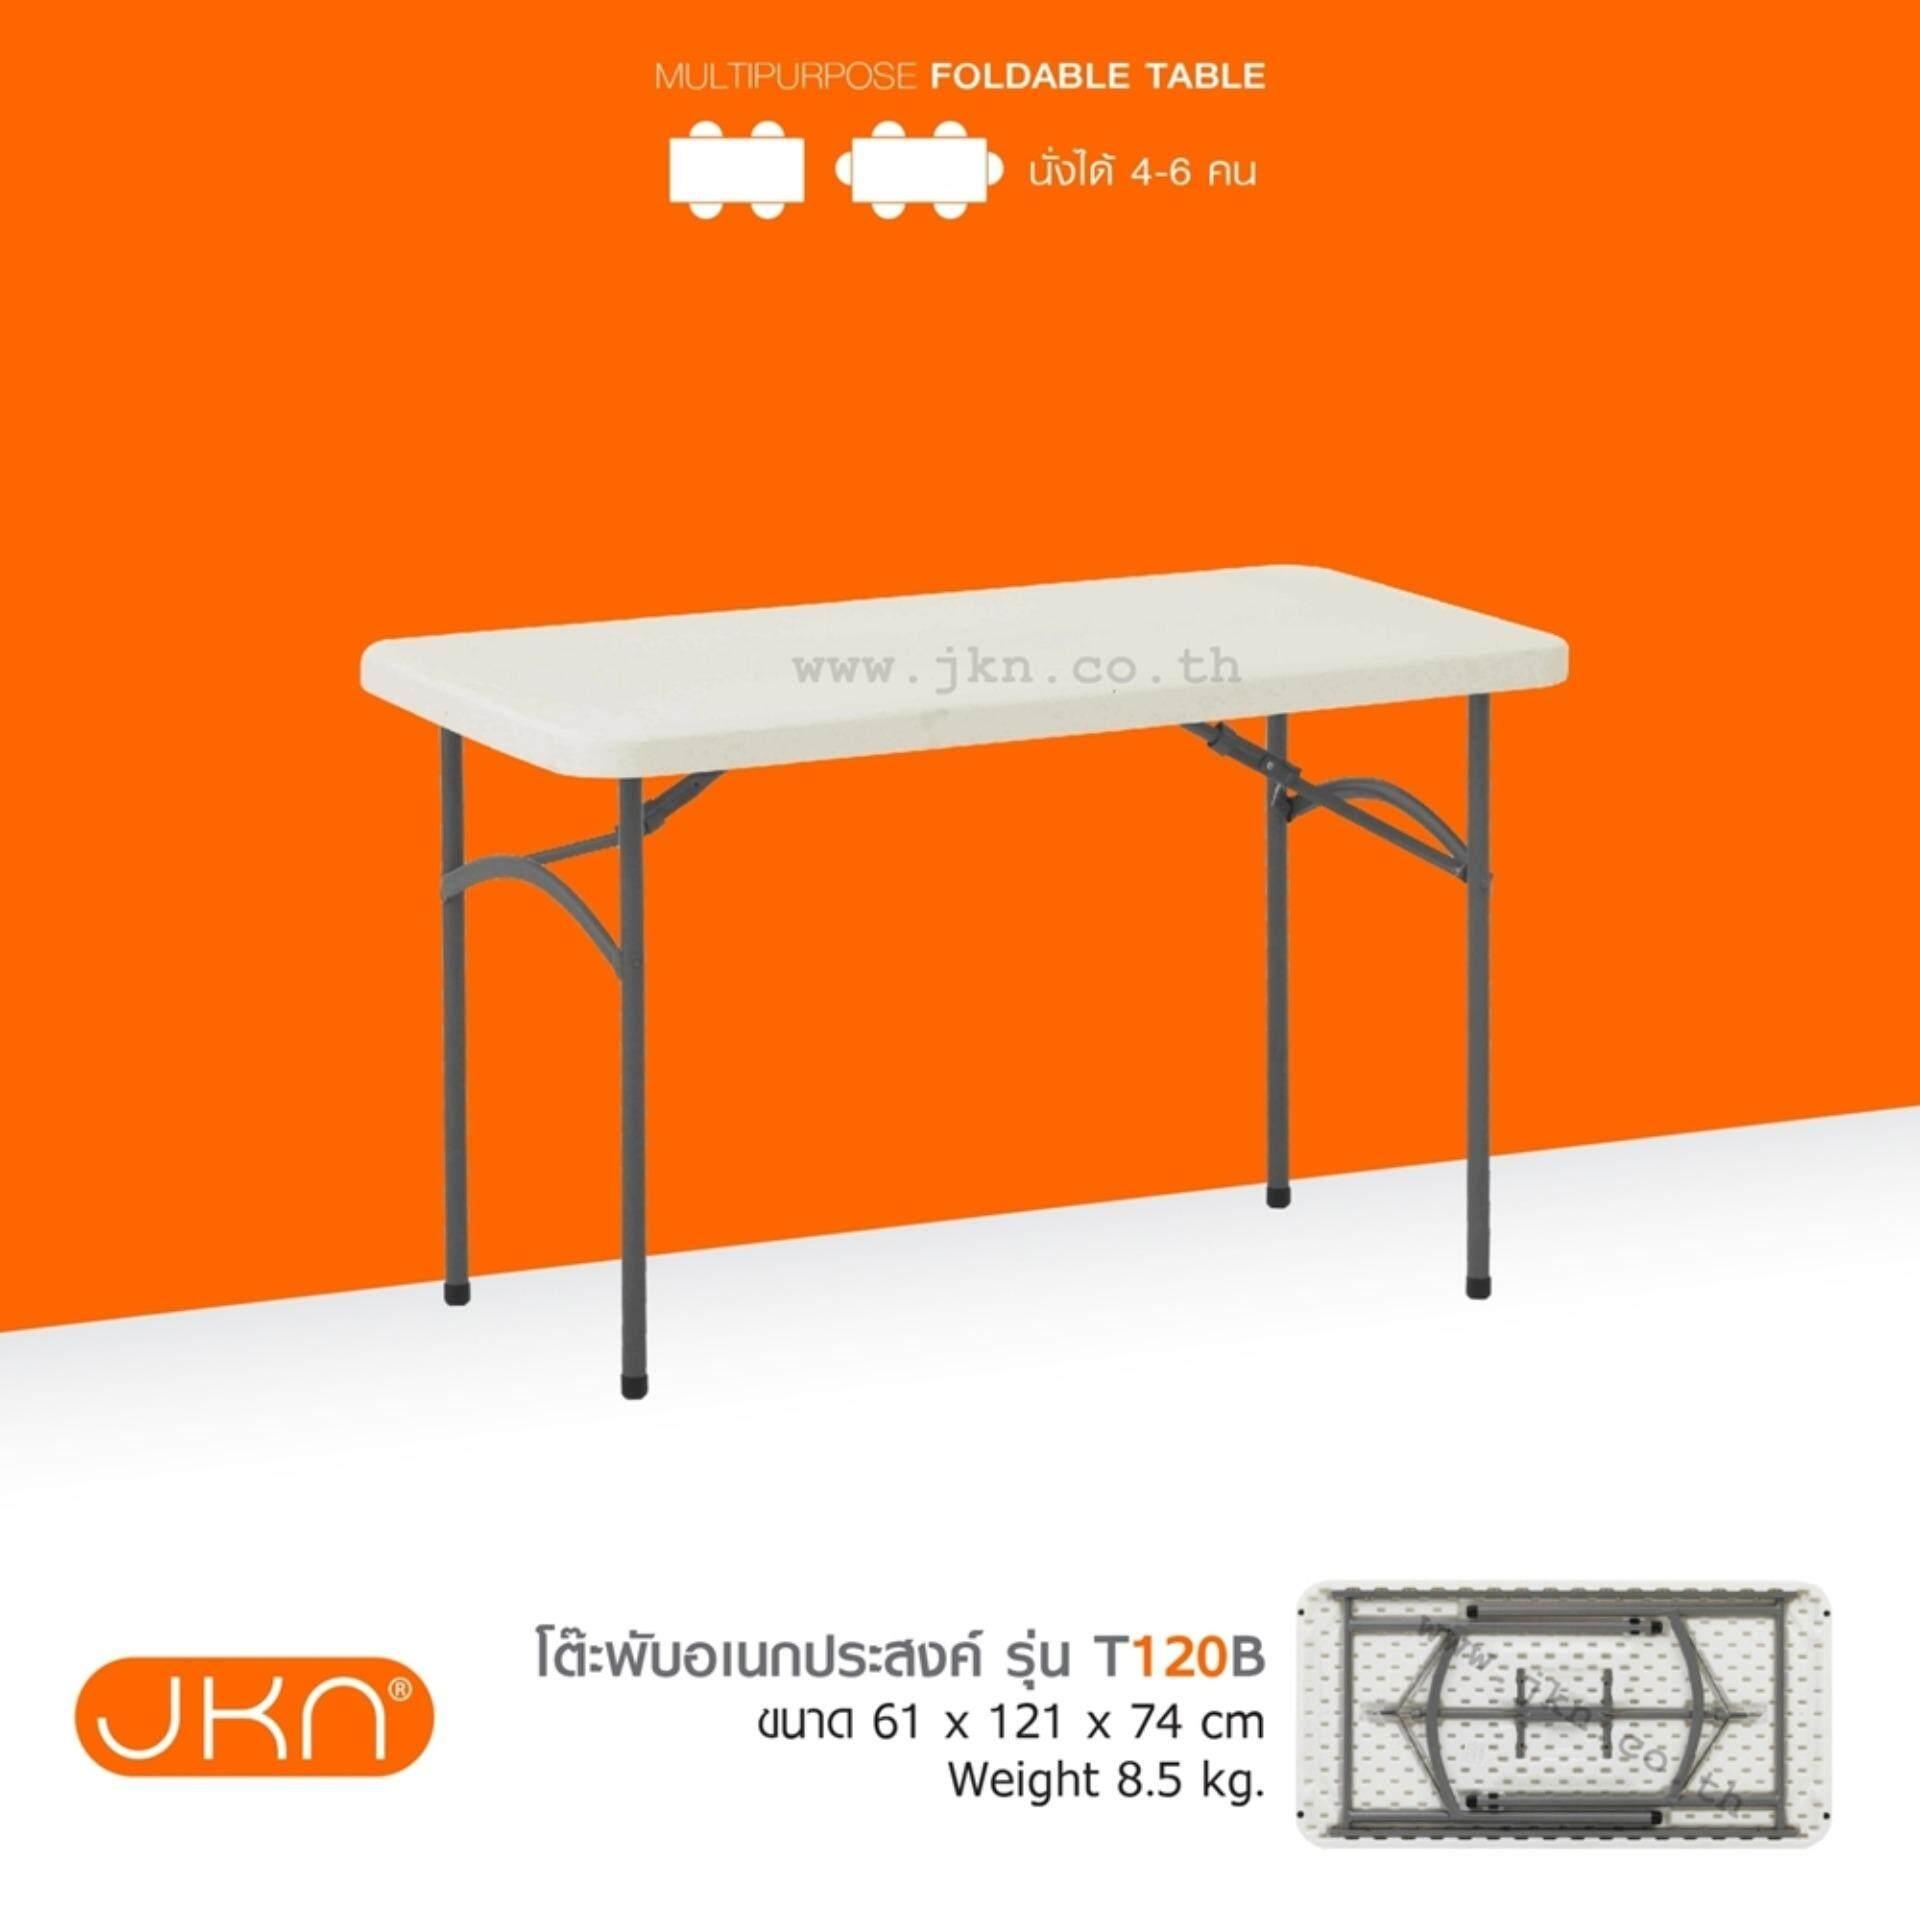 Jkn โต๊ะพับอเนกประสงค์ รุ่น T-120b By Mc Plus.